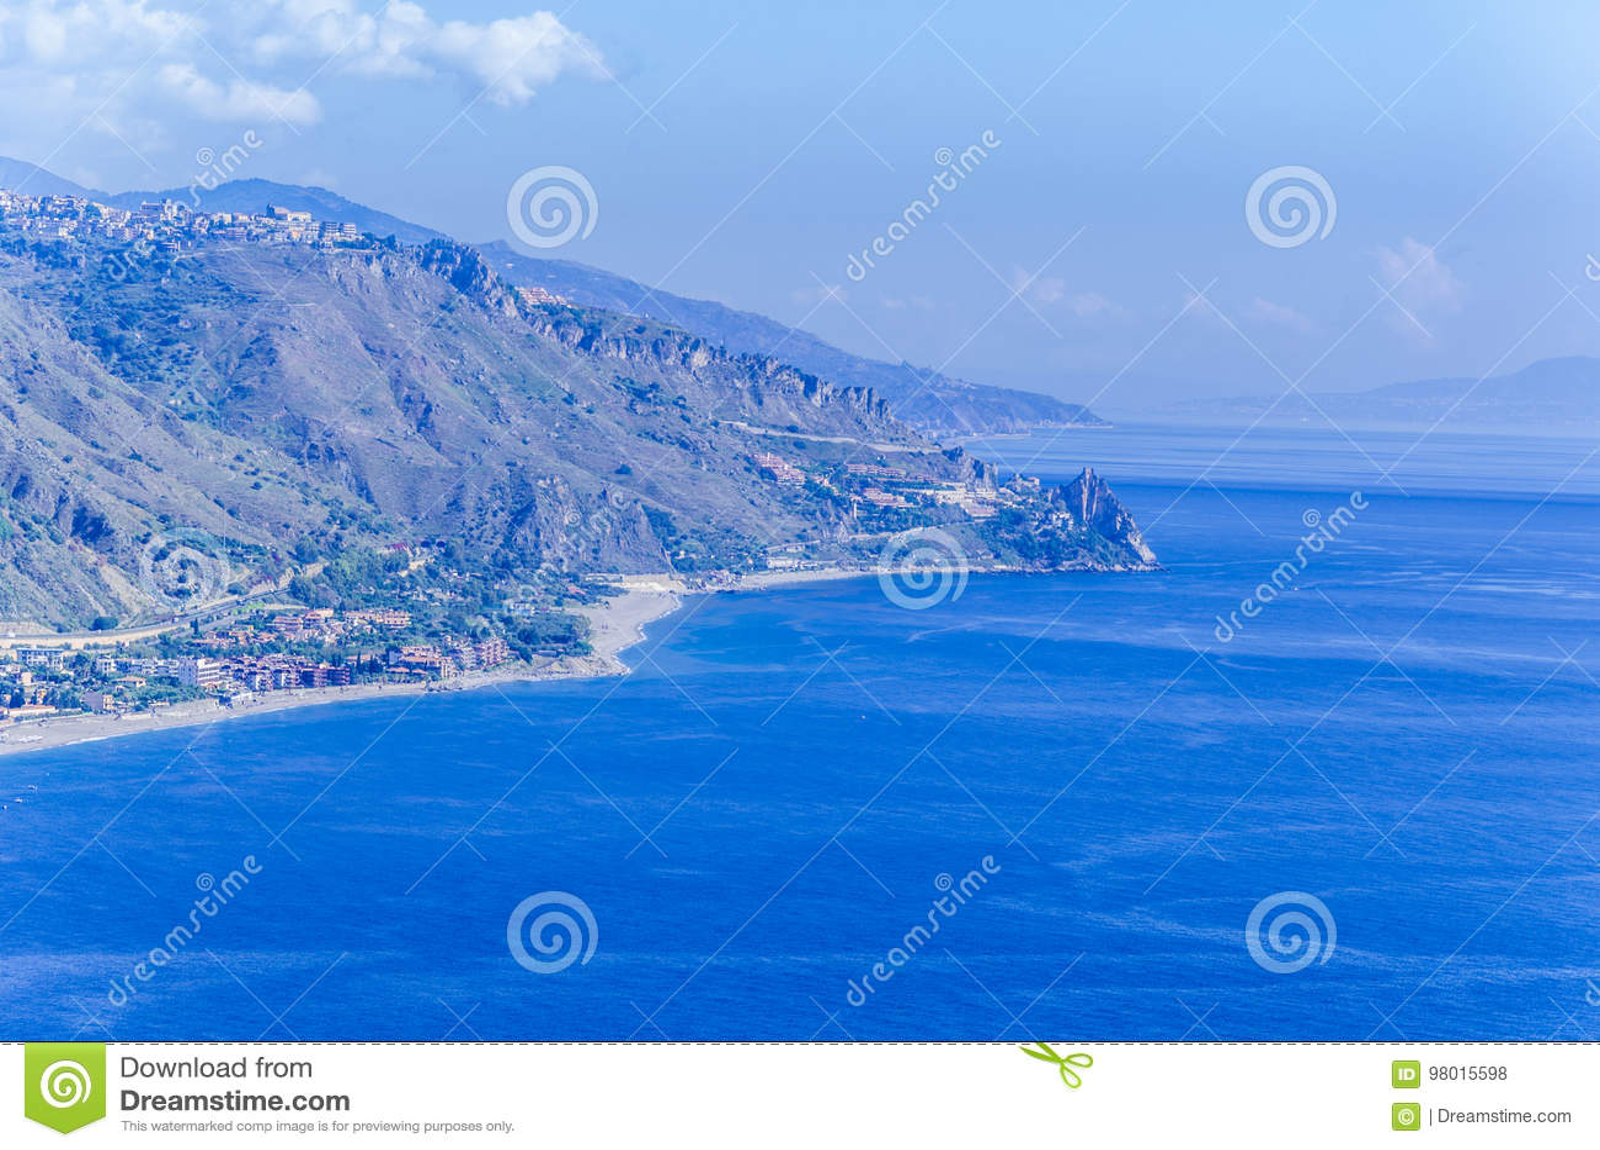 Mountain coasts and sicilian beaches in and around taormina